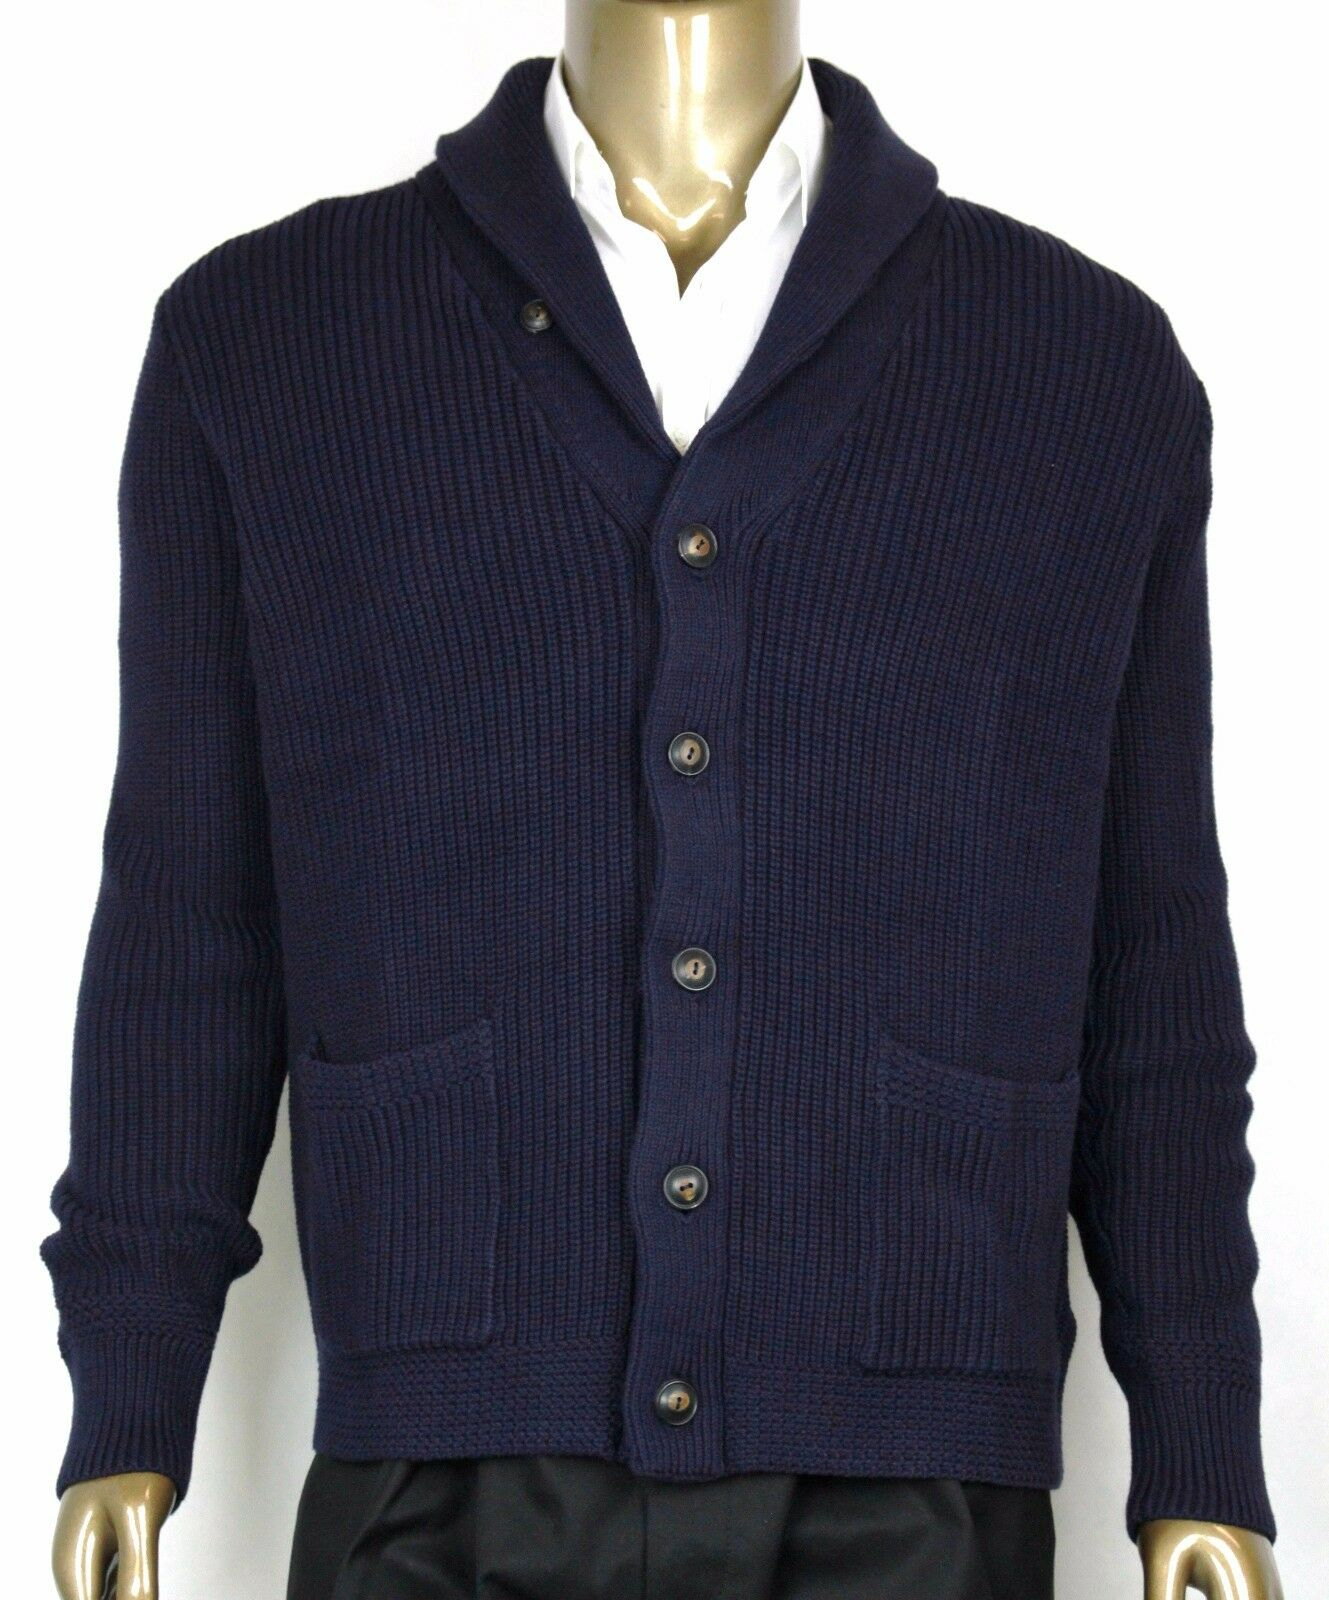 New Polo Ralph Lauren Men's Cotton Shawl Cardigan Sweater Navy, L, 0186171 WGB